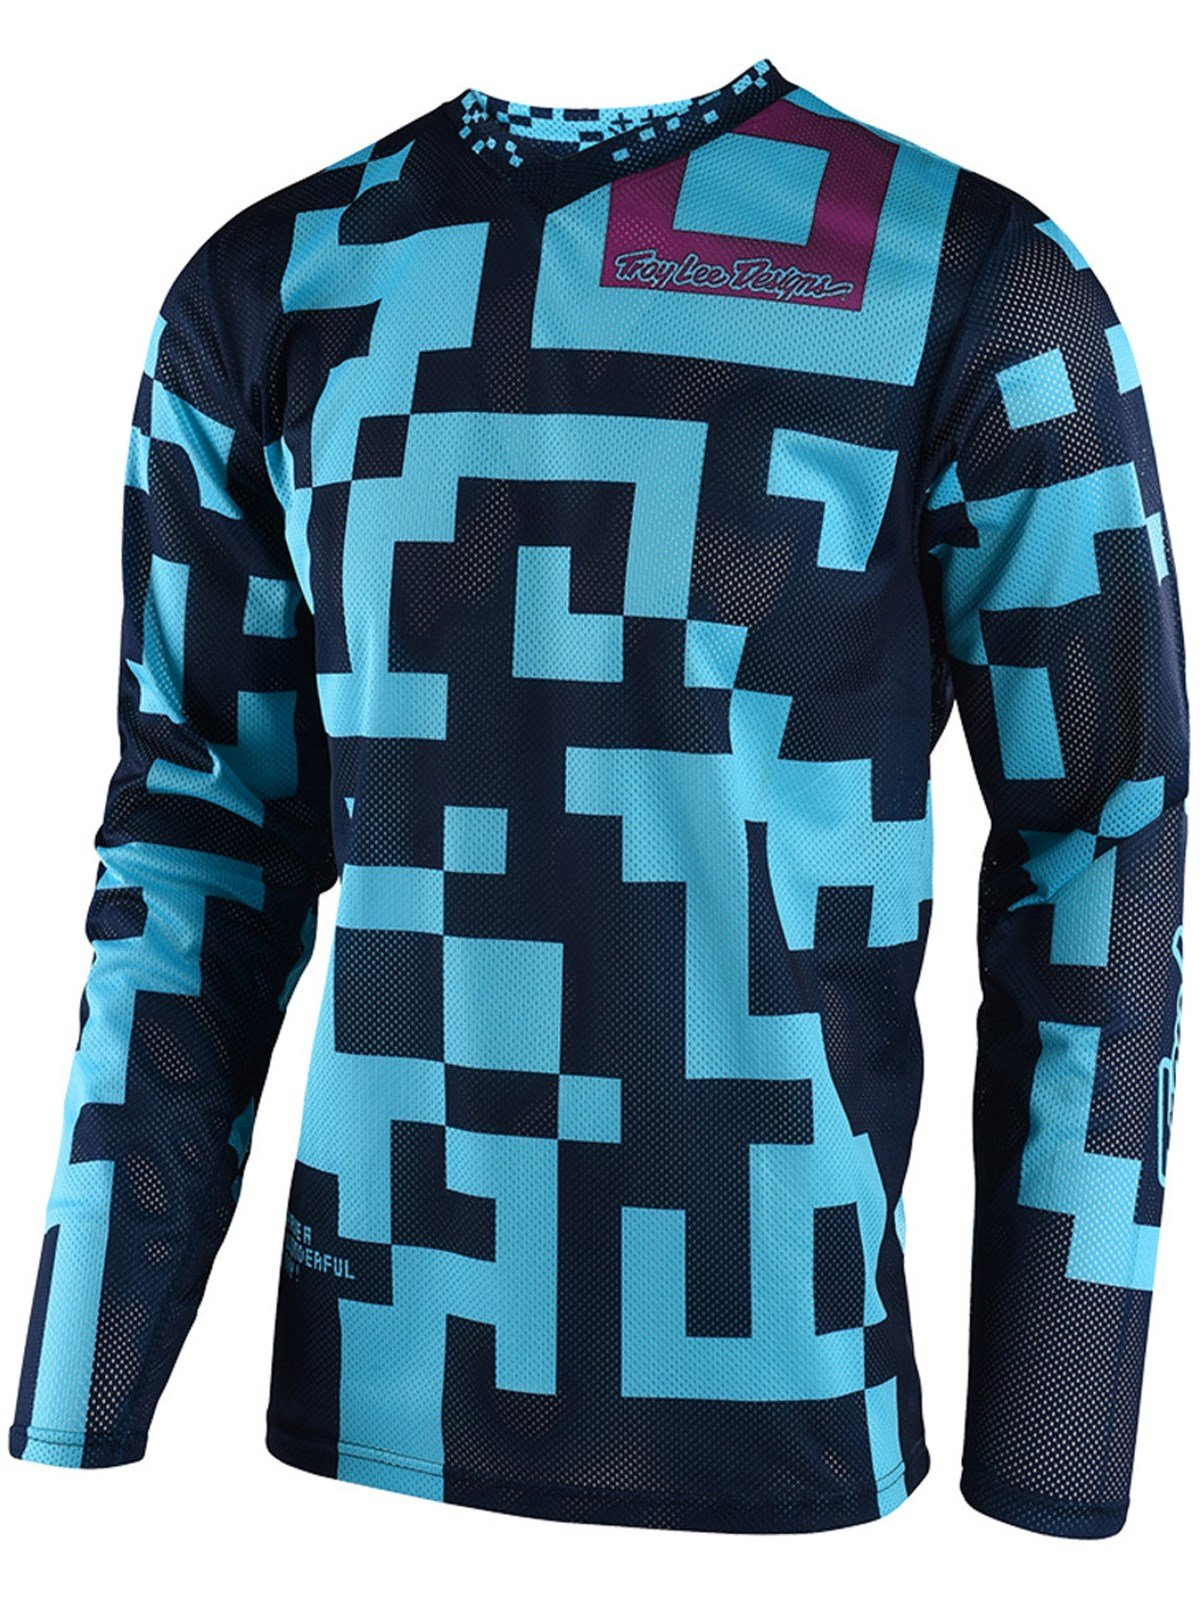 Troy Lee Designs GP Air Maze Men's Off-Road Motorcycle Jersey - Turquoise/Navy / Medium